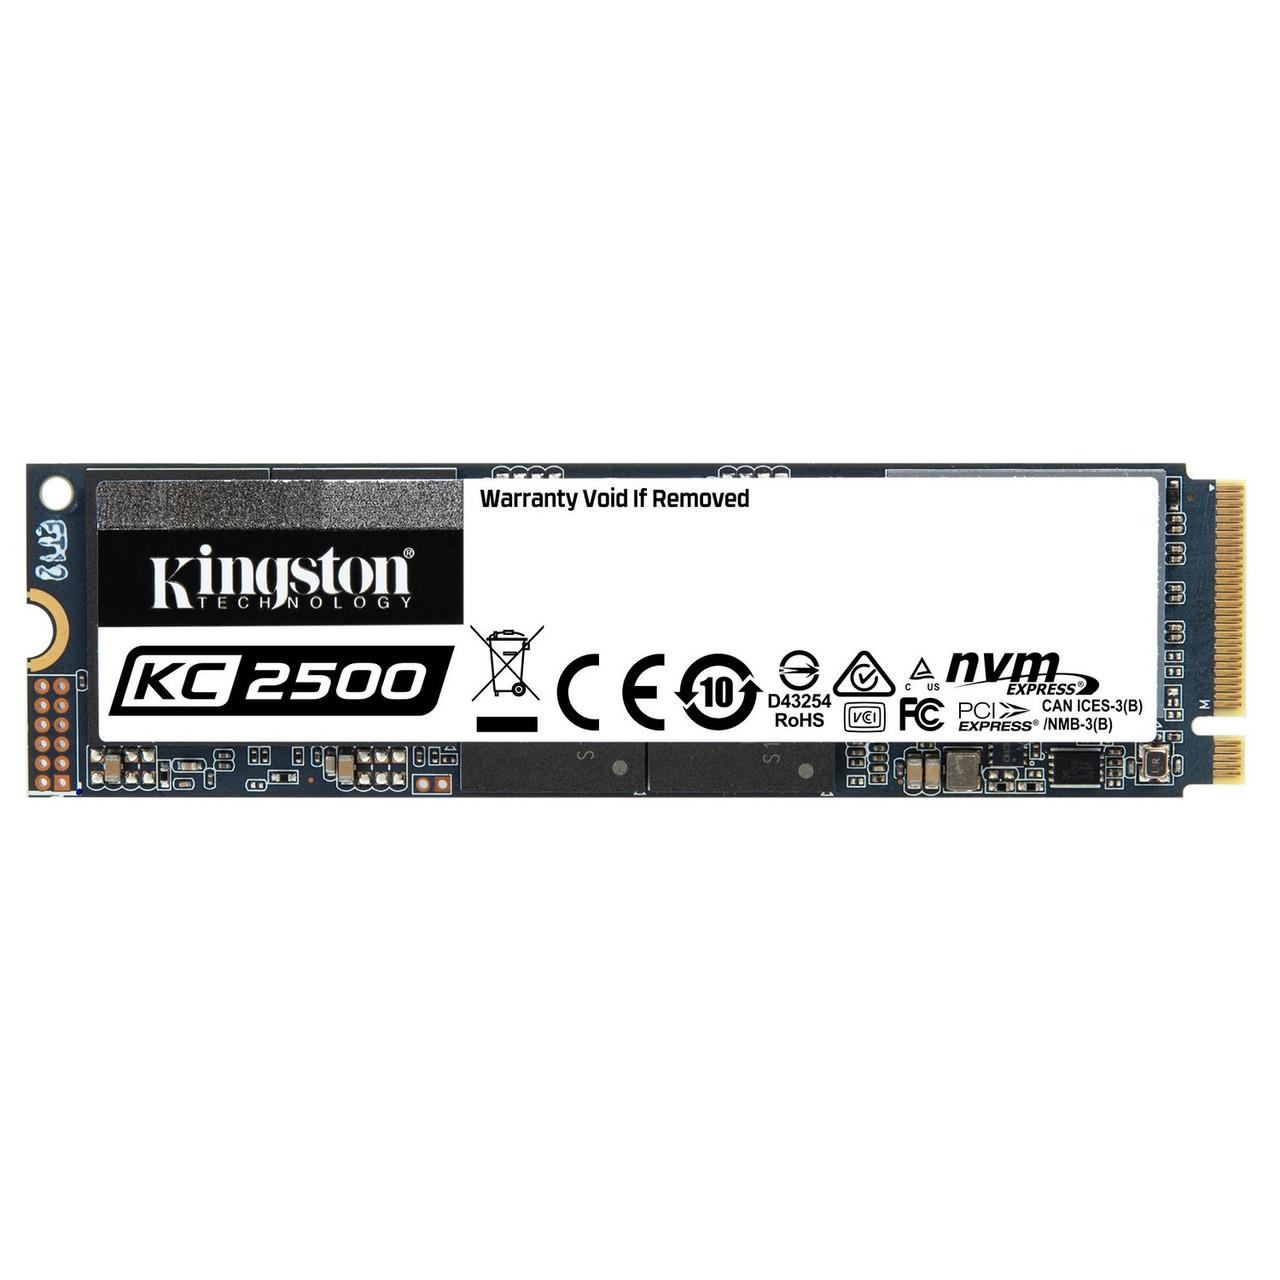 Накопичувач SSD Kingston KC2500 250 GB M. 2 (PCIe 3.0) 3D TLC (SKC2500M8/250G)